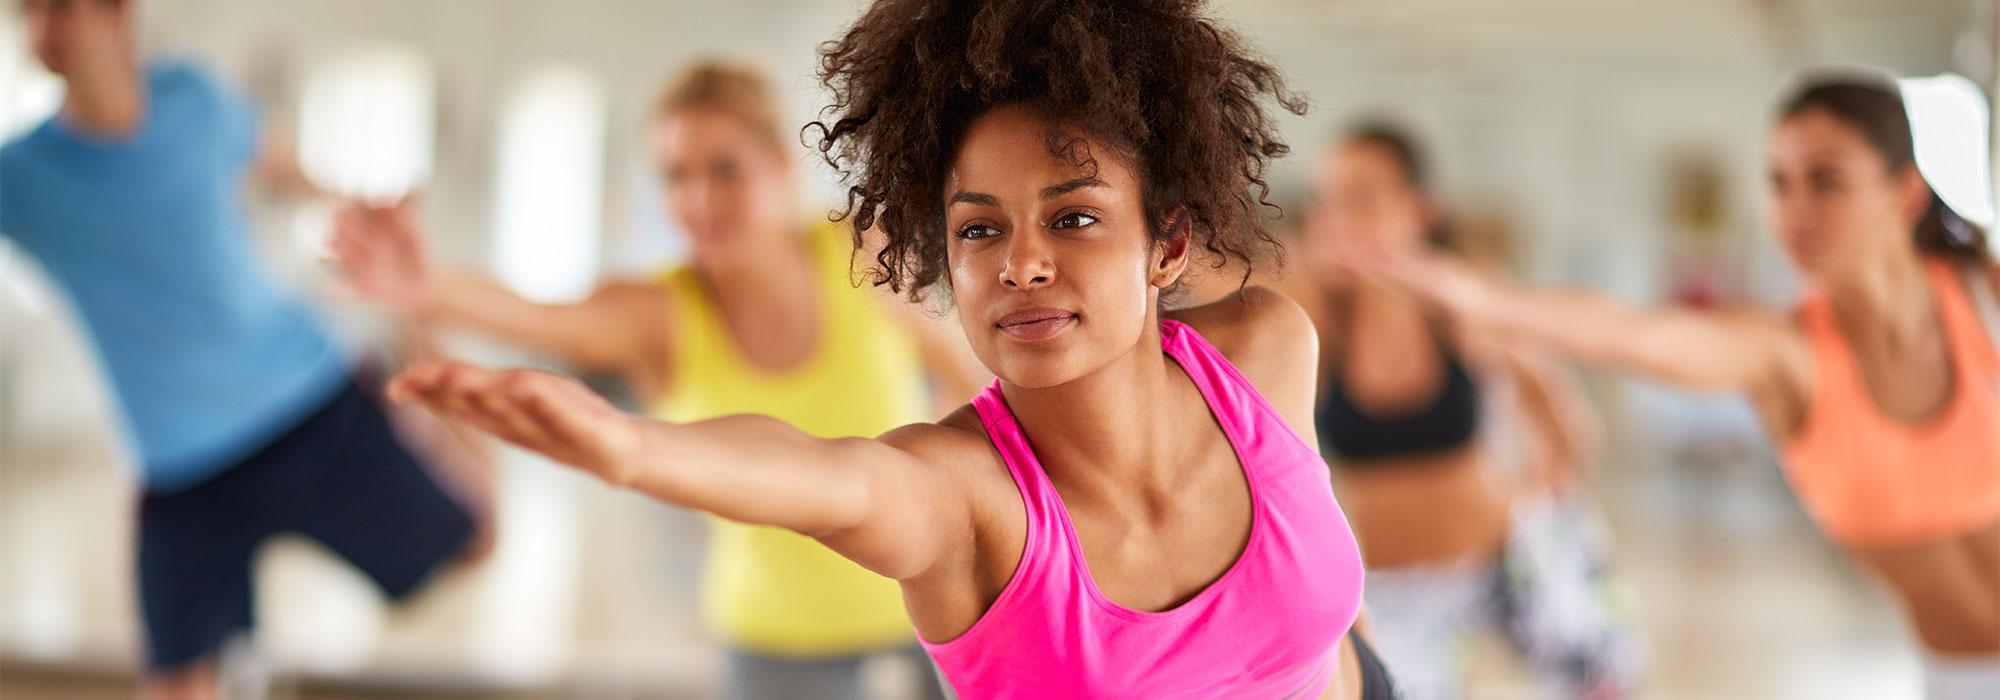 Group Fitness TRX Class